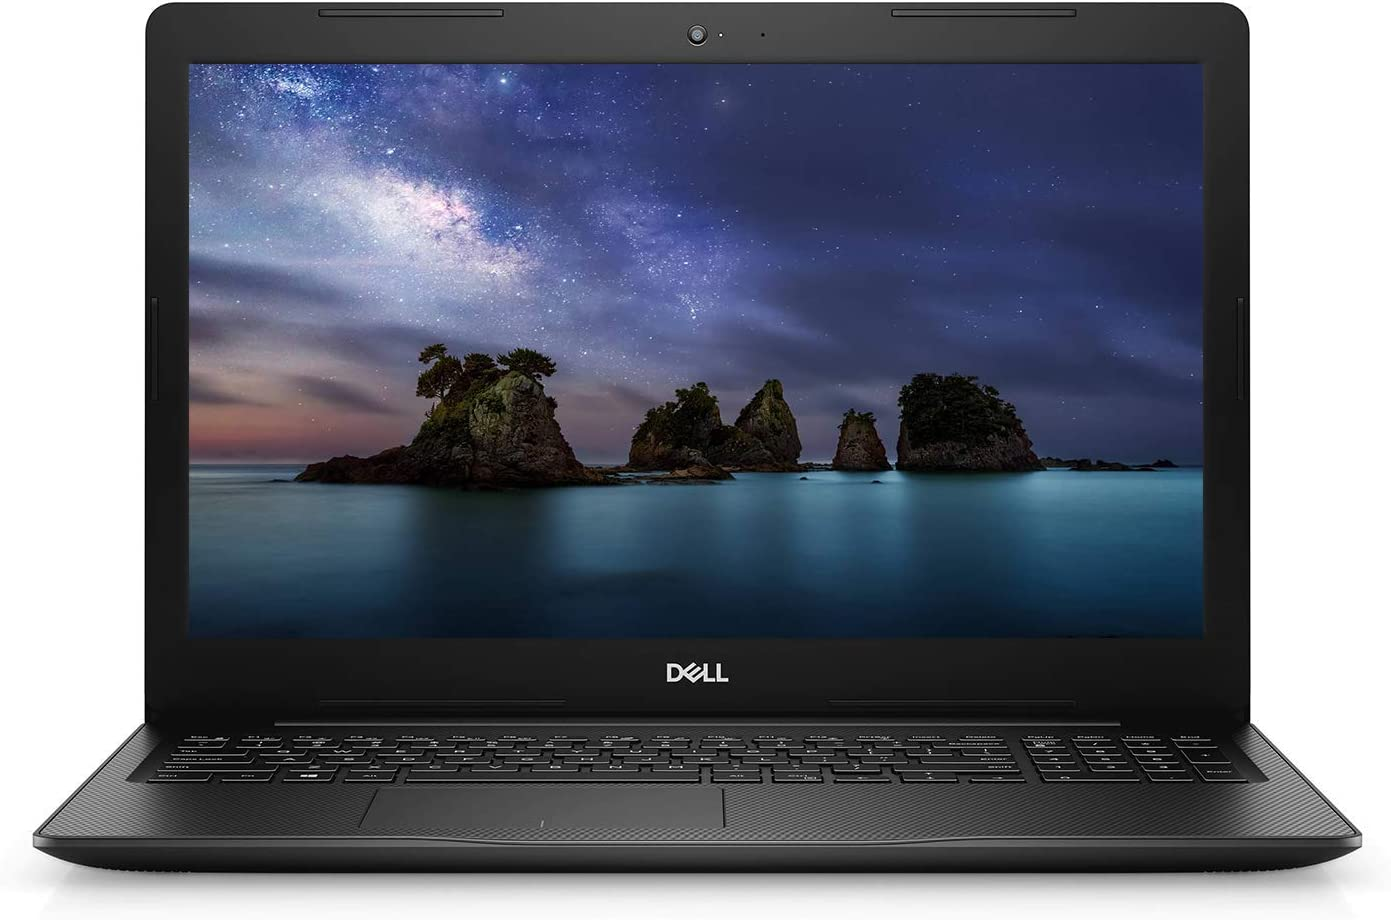 Dell Inspiron 15 3000 Laptop, 15.6